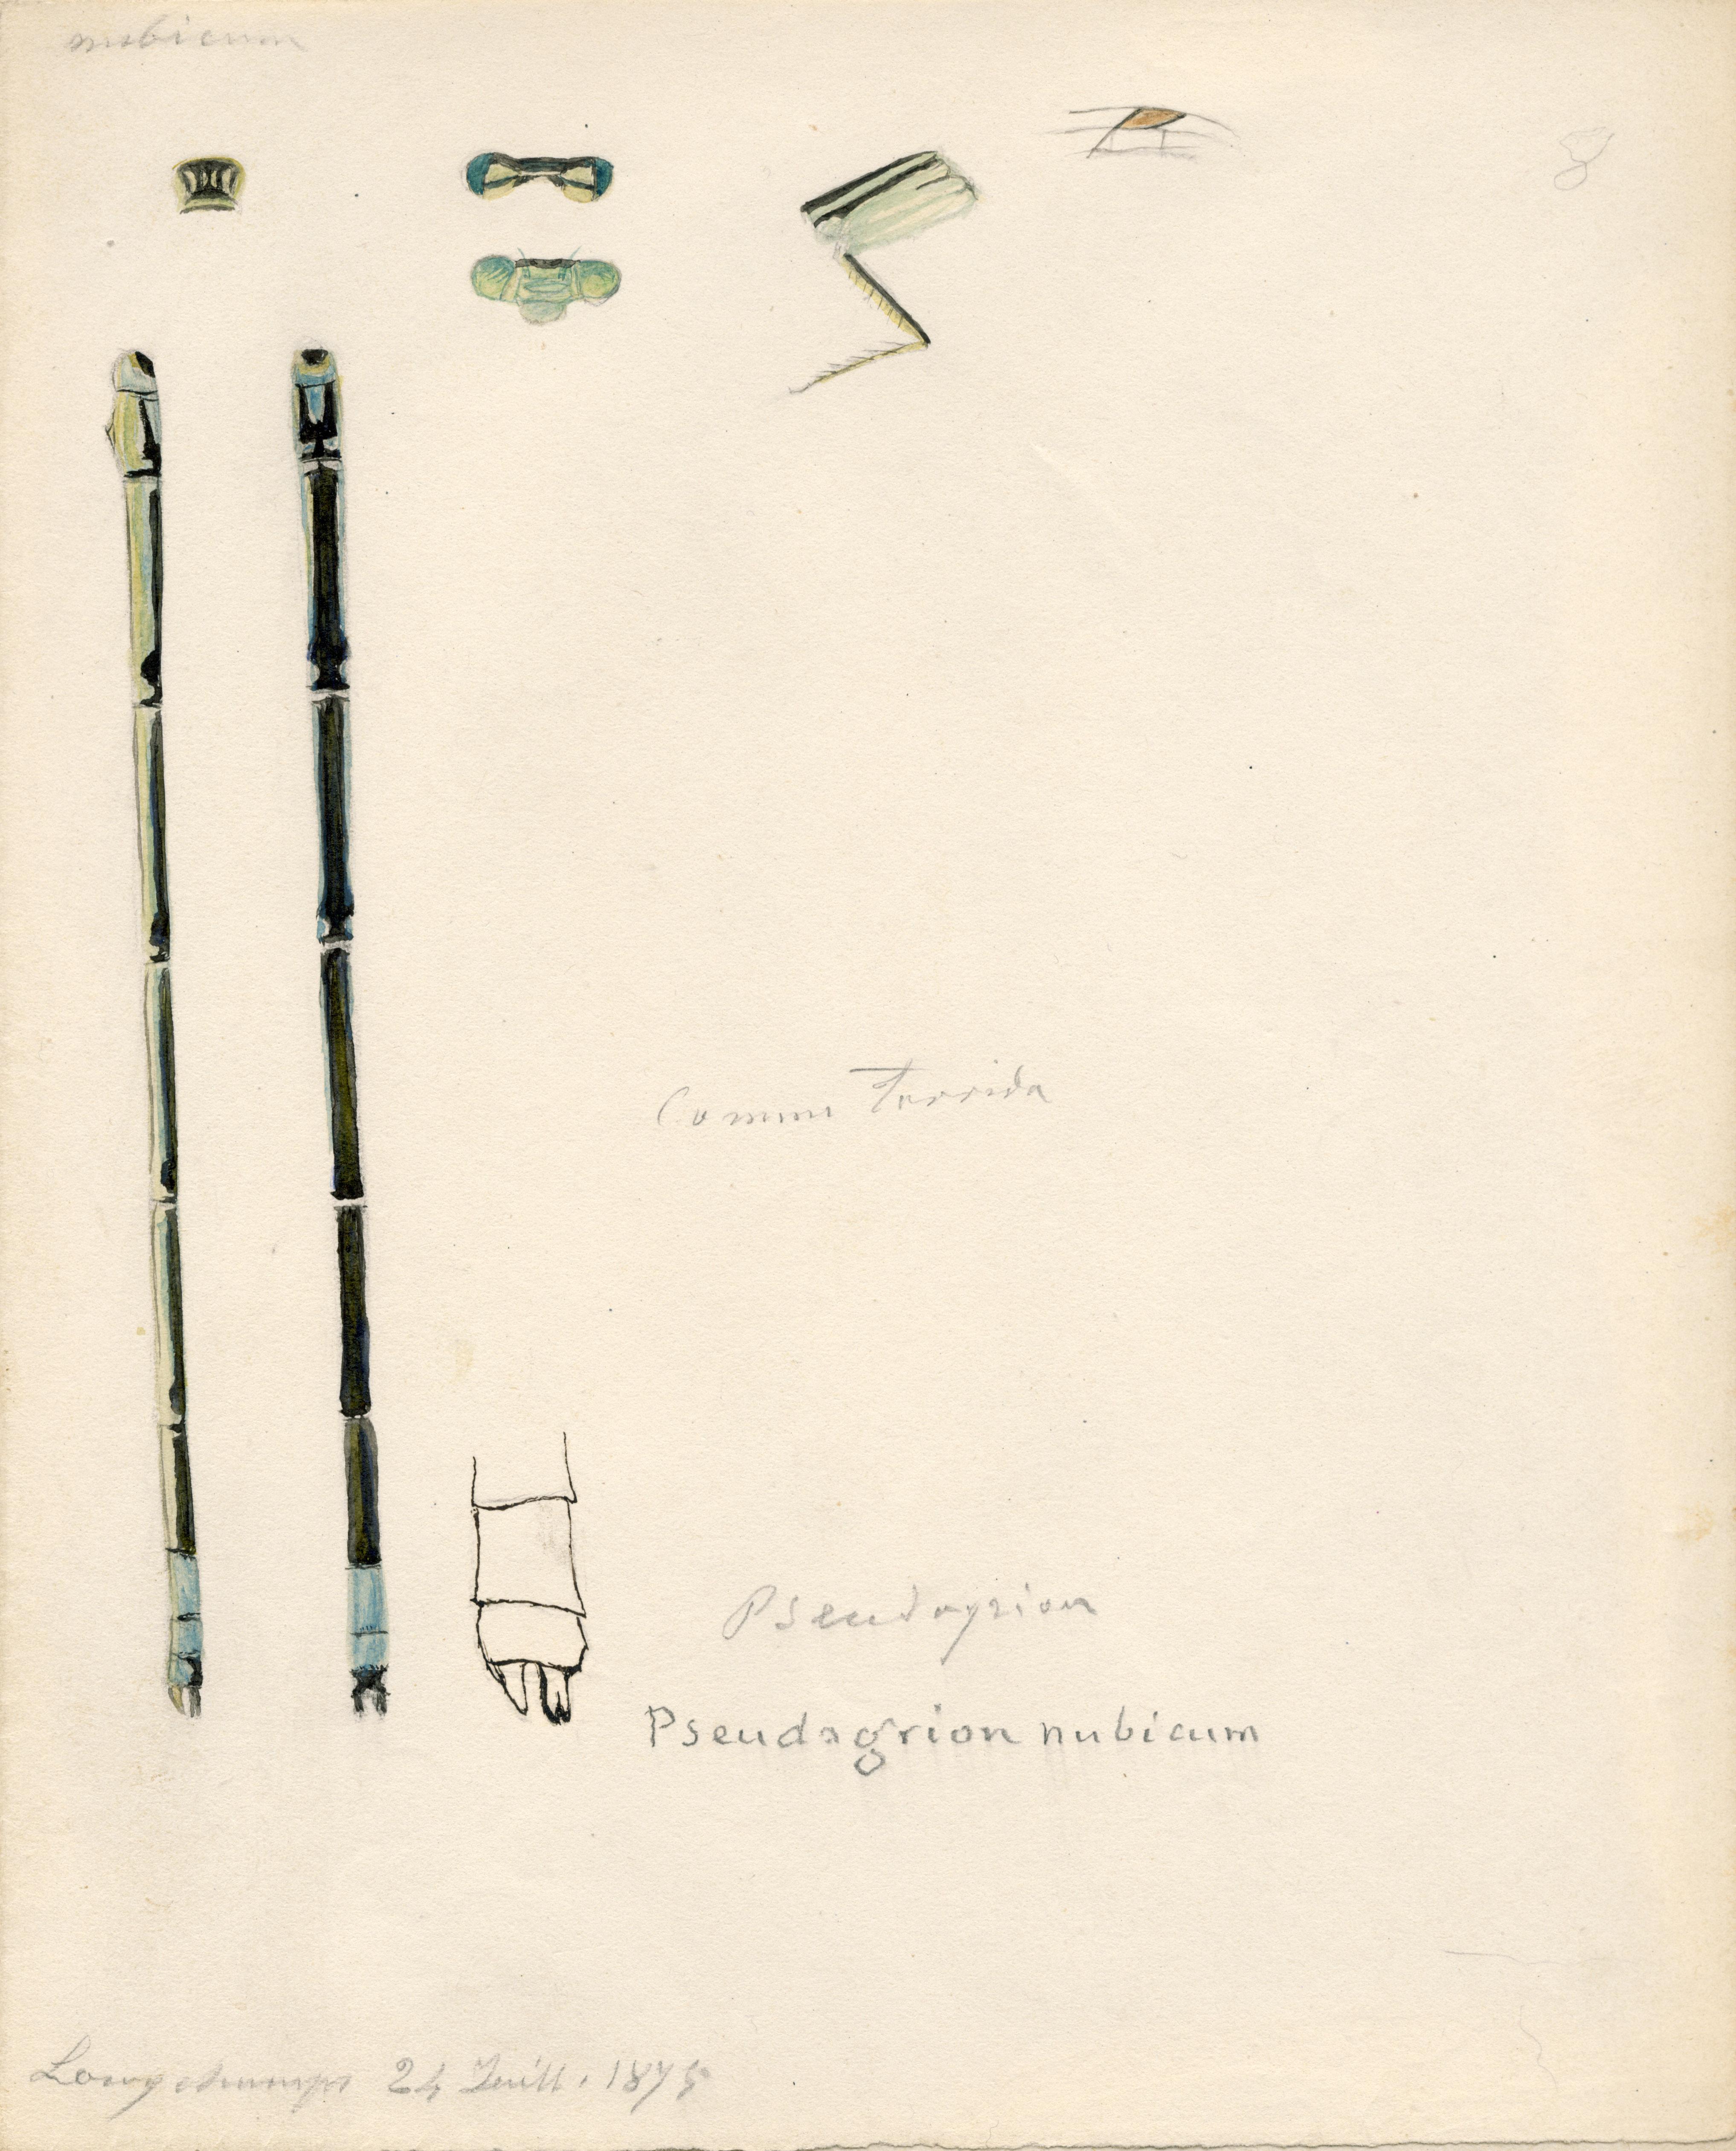 Pseudagrion nubicum.jpg